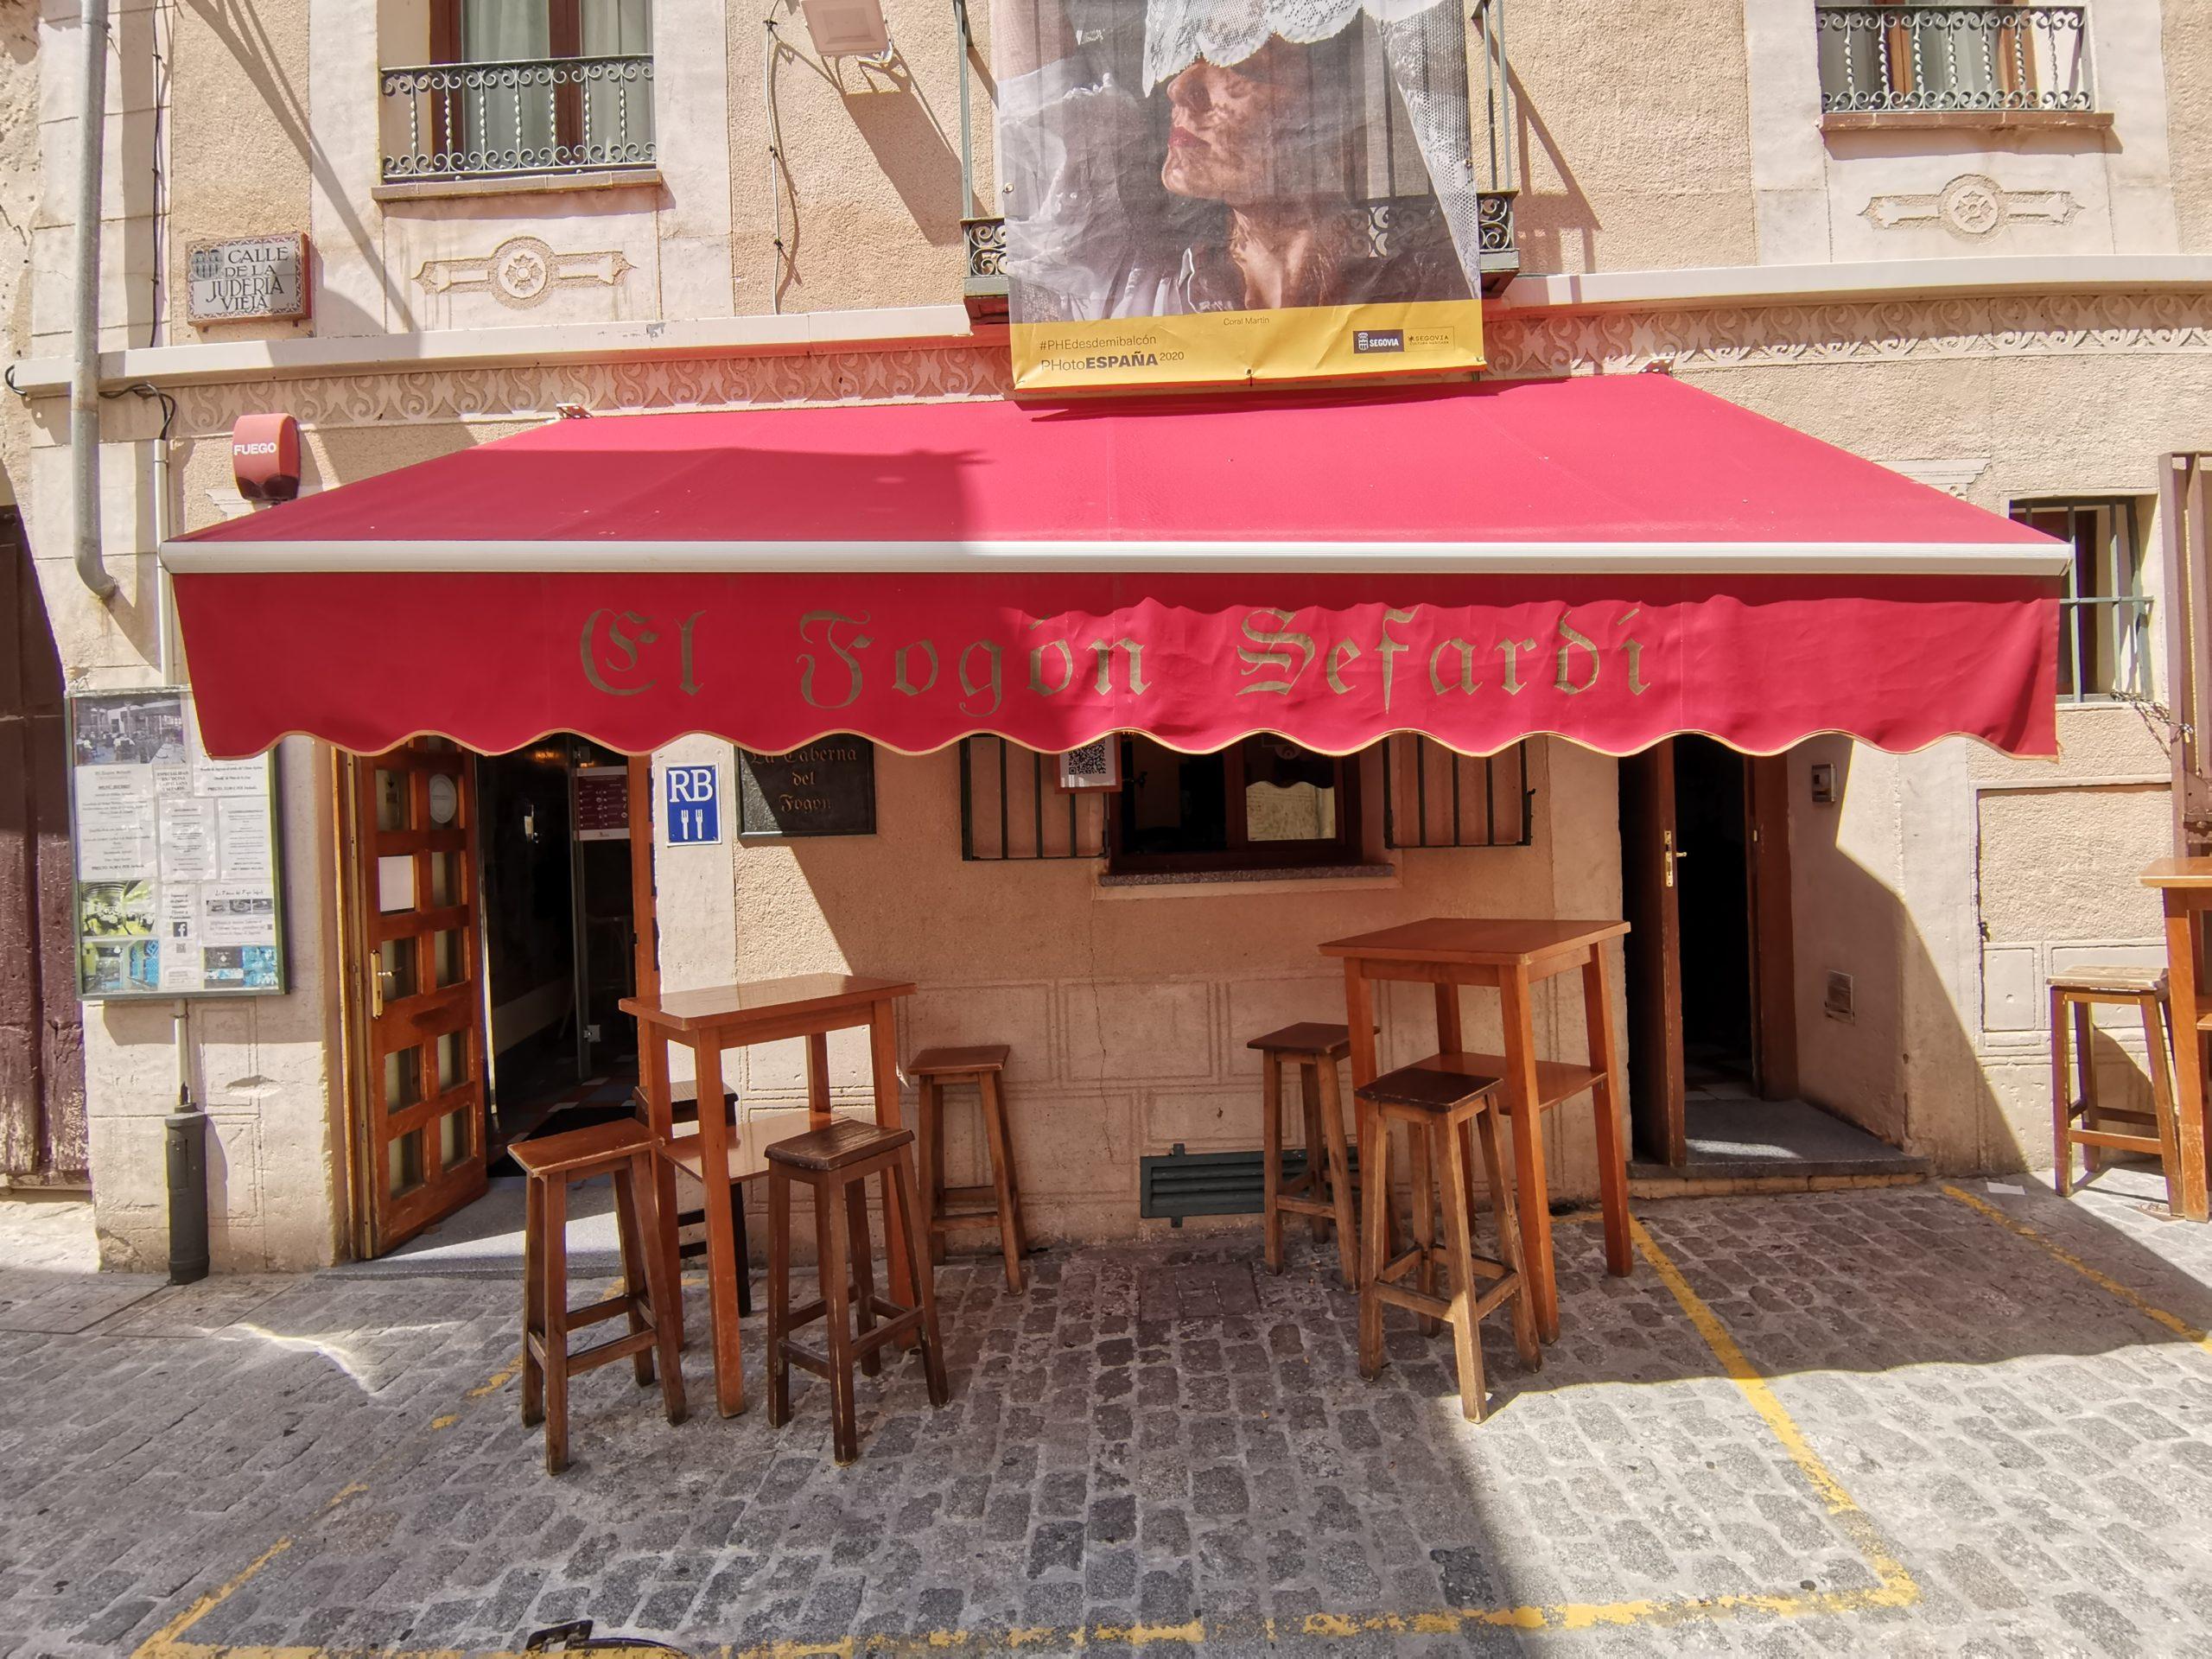 el-fogón-sefardí-Segovia